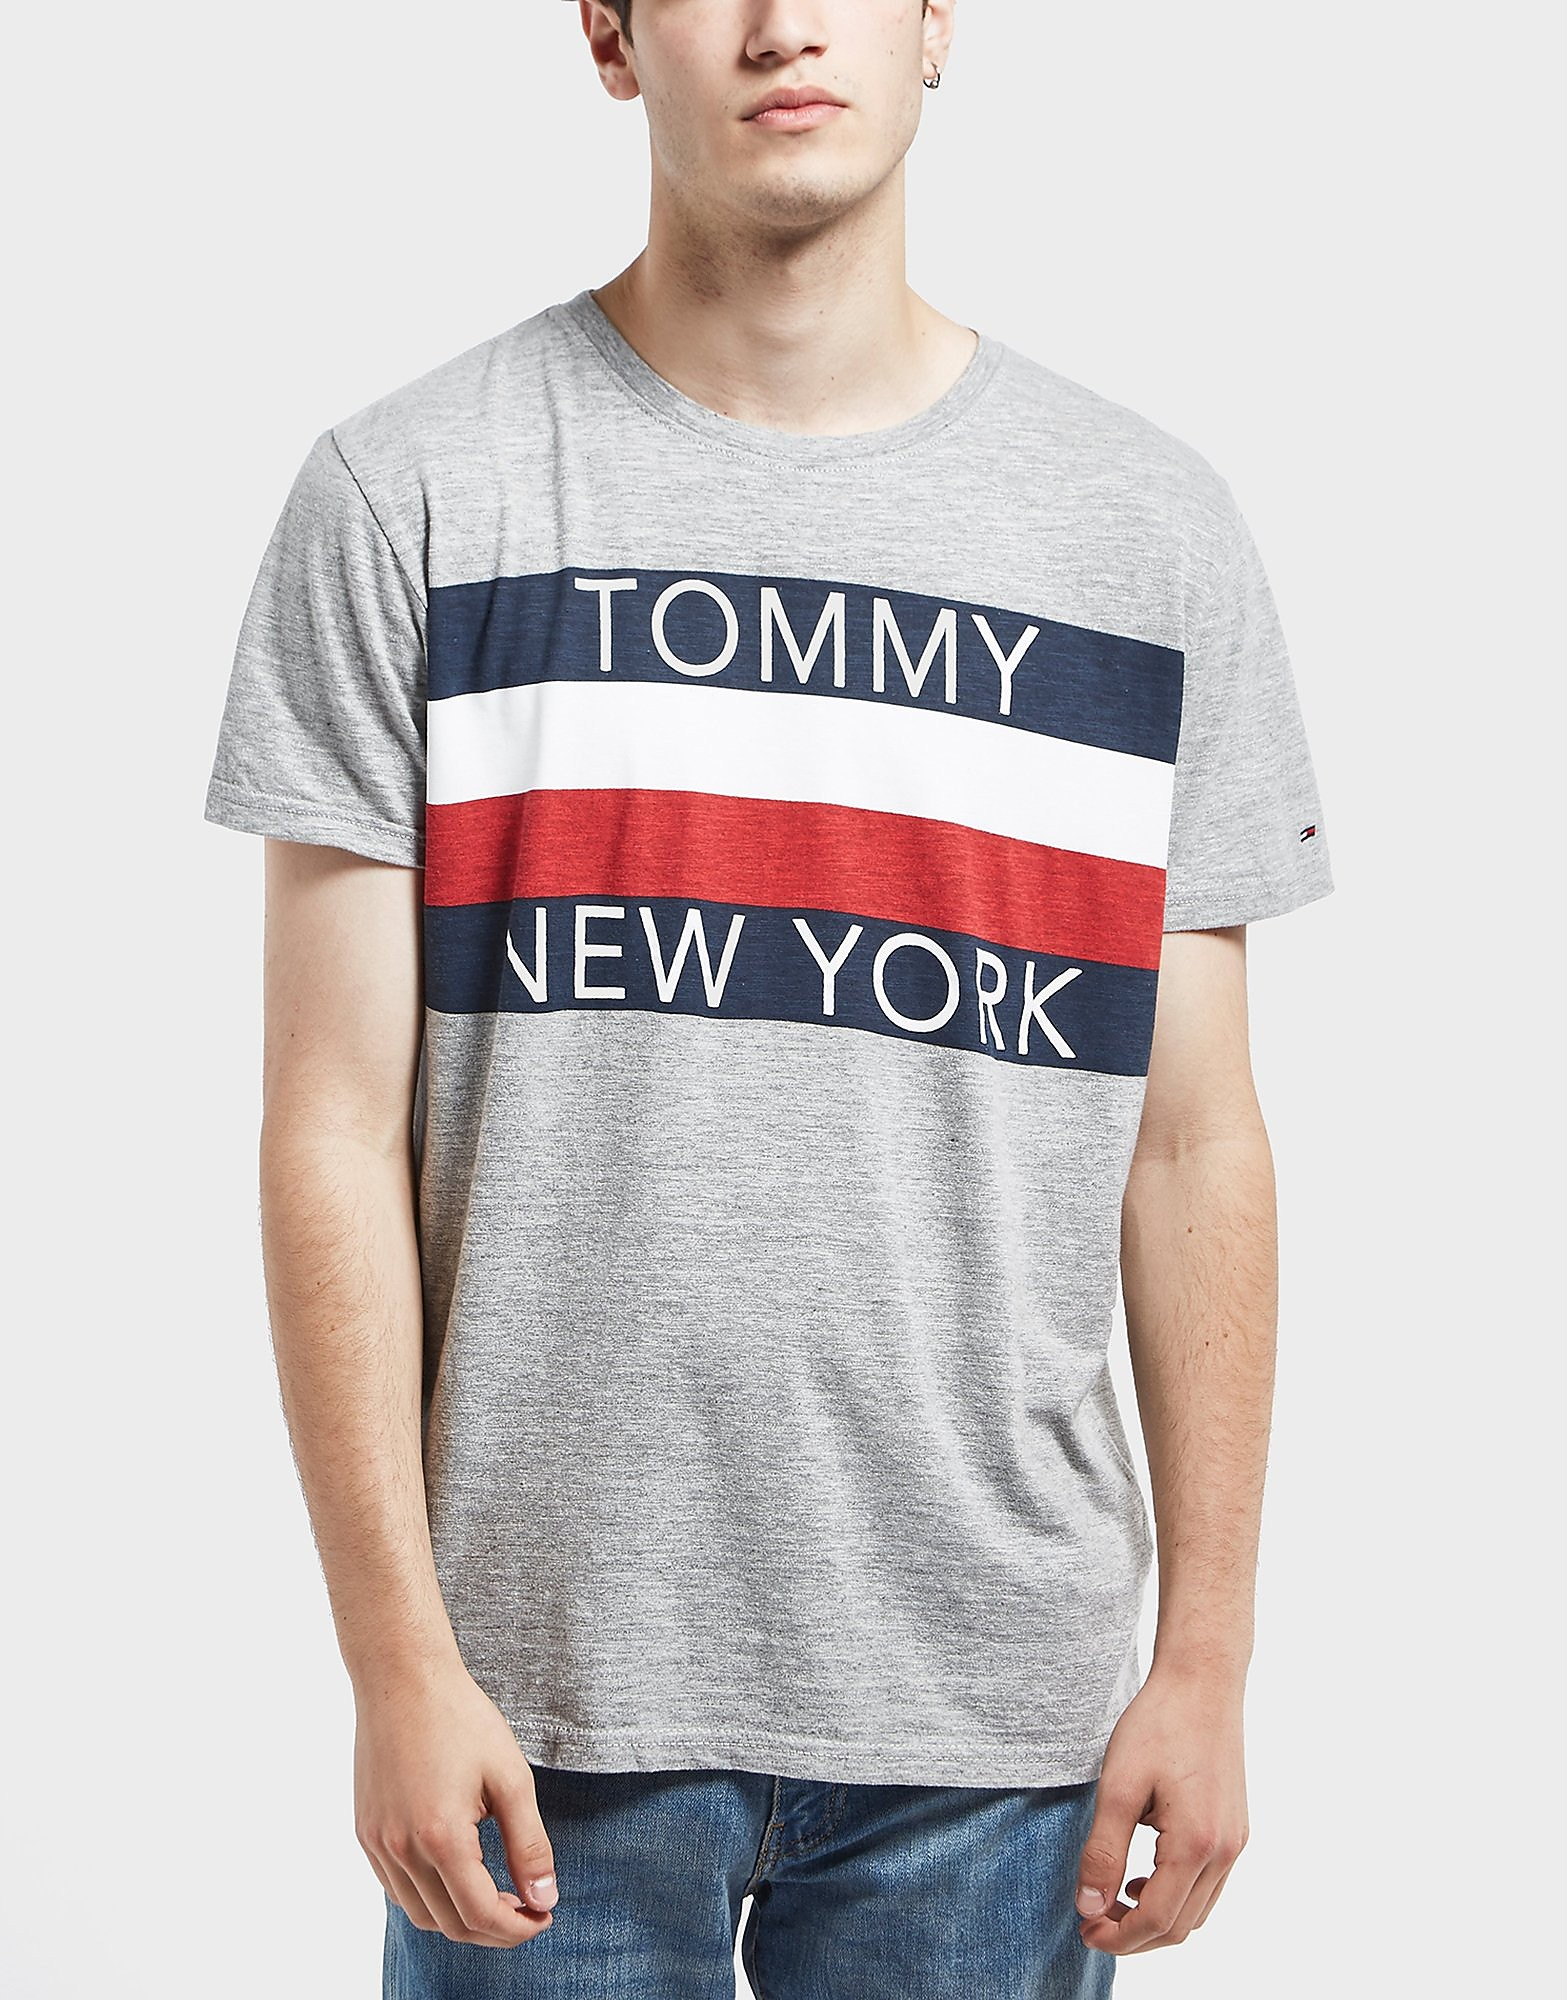 Tommy Hilfiger Panel Short Sleeve T-Shirt